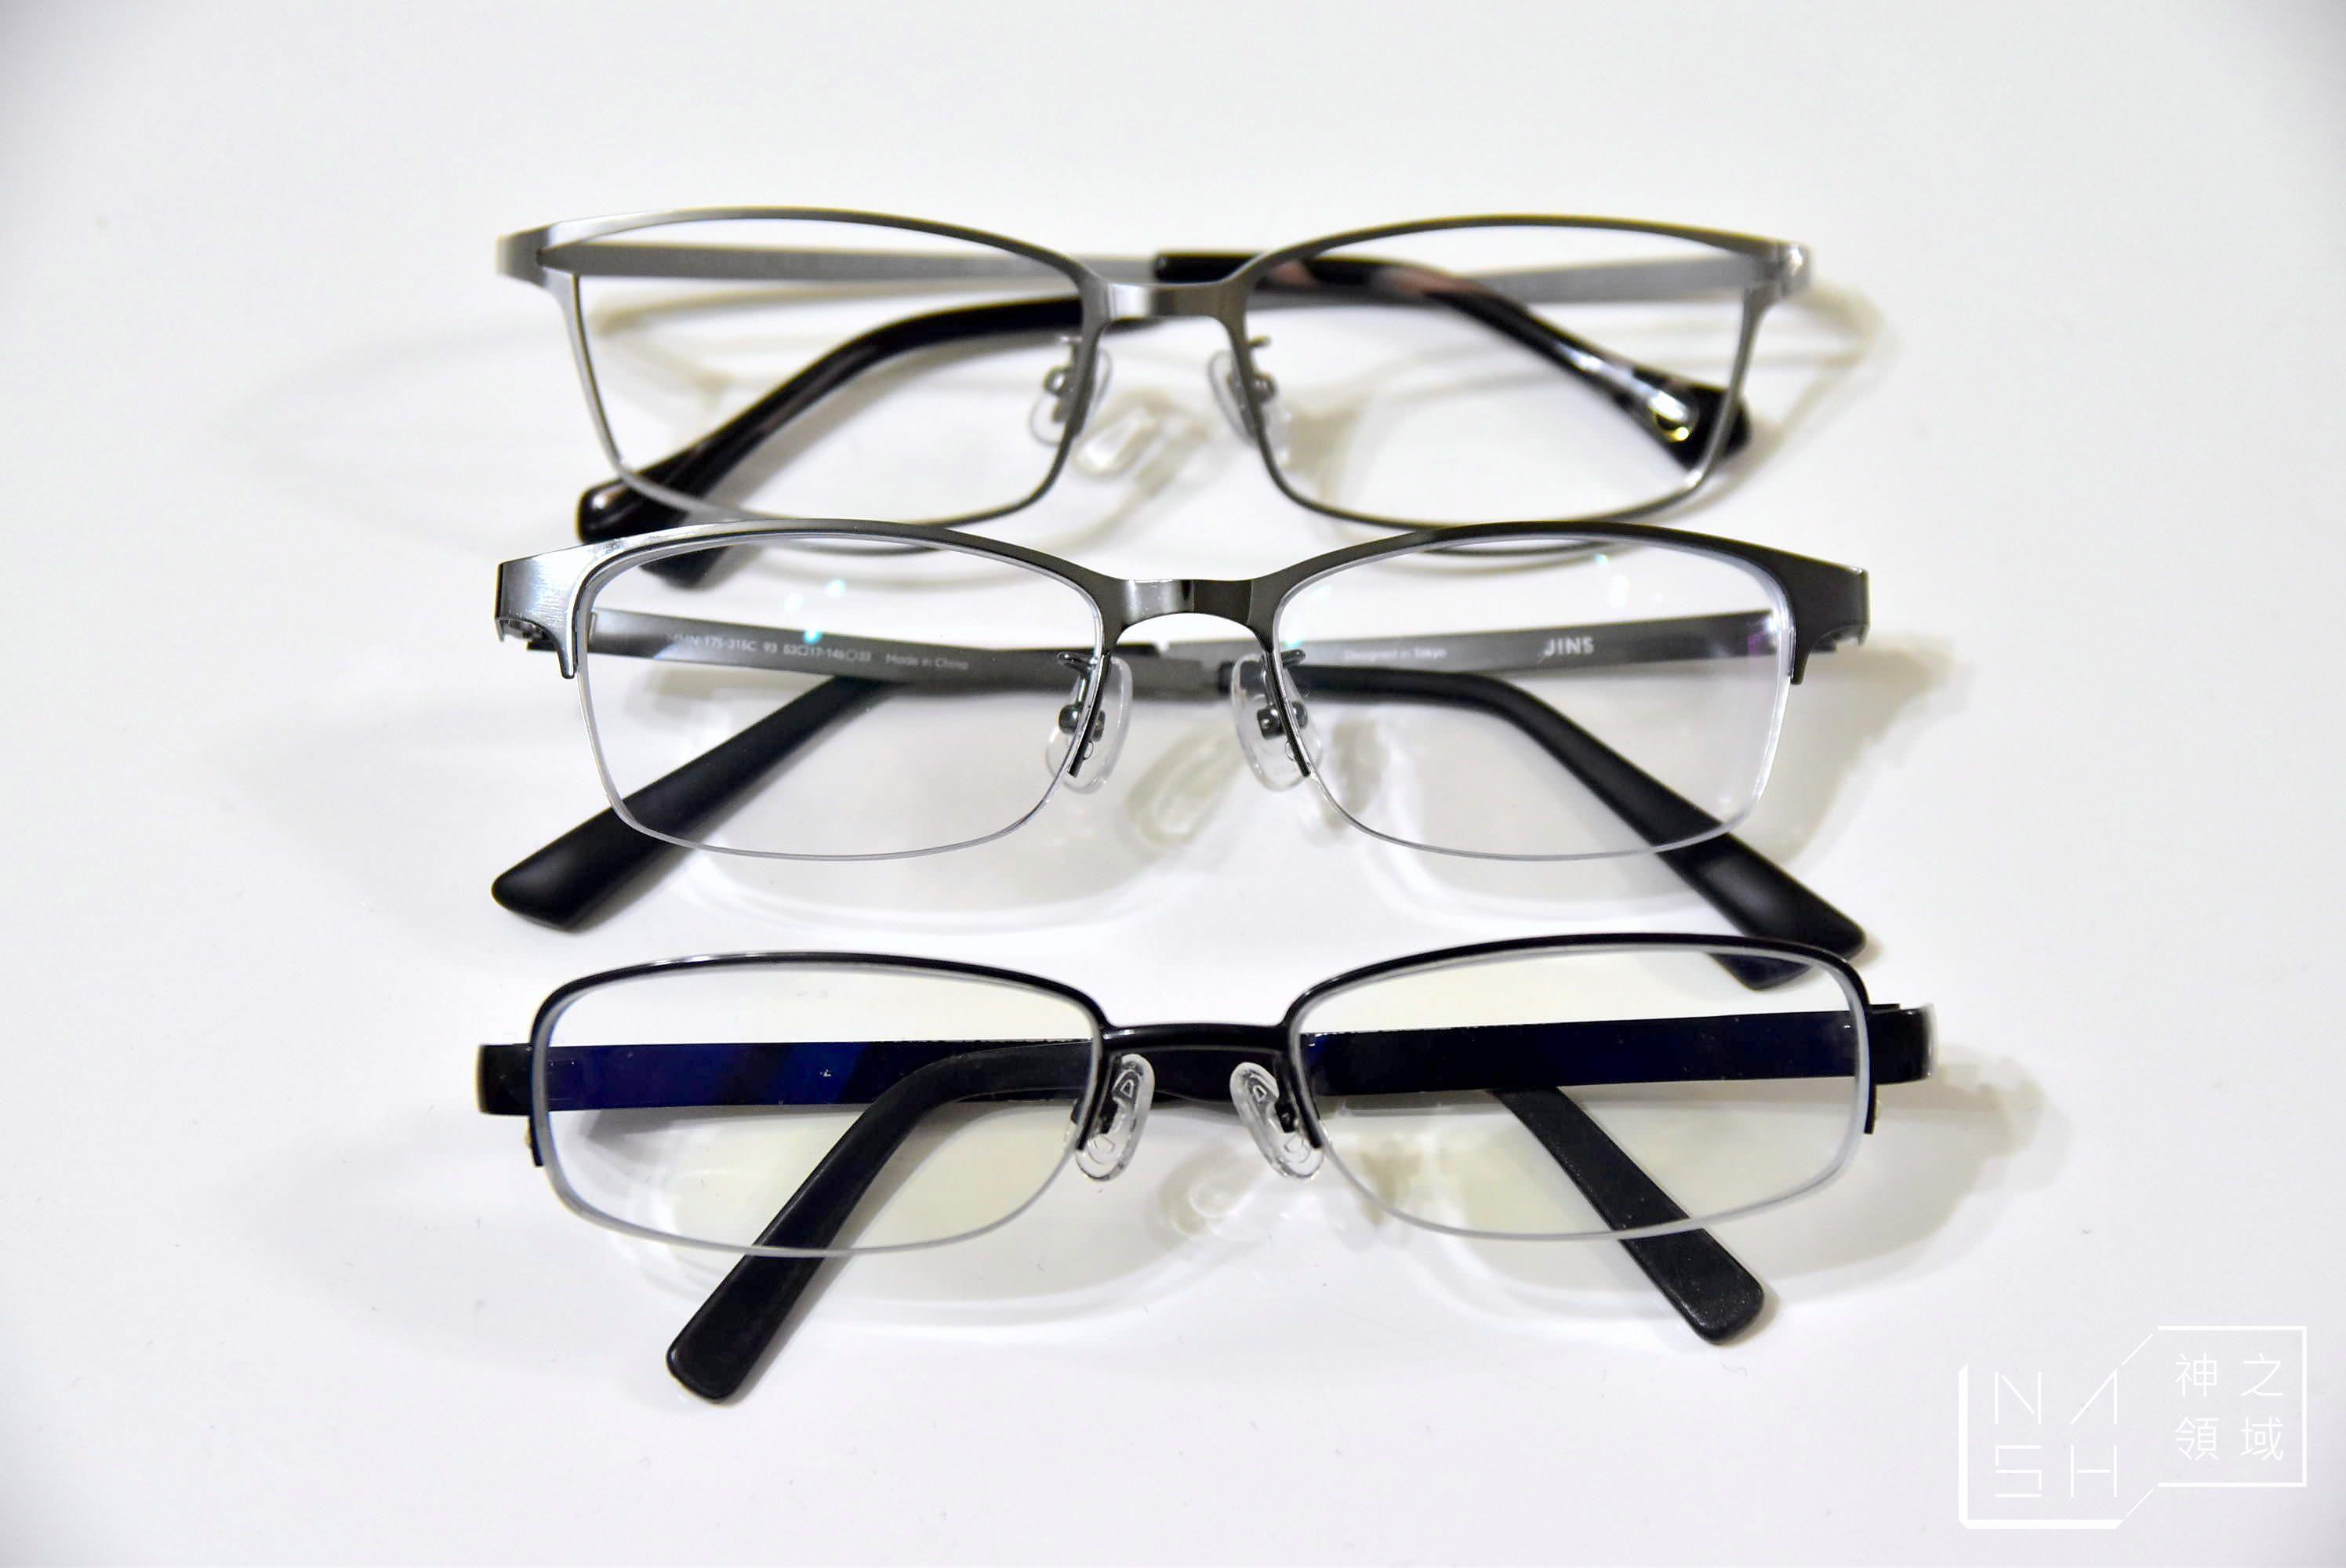 HOYA新精彩變色鏡片,OWNDAYS眼鏡,OWNDAYS價格,OWNDAYS款式,OWNDAYS評價,JINS眼鏡,JINS款式,JINS價格,JINS評價,益群眼鏡,陽光眼鏡,hOYA鏡片,台北眼鏡行推薦,眼鏡行推薦 @Nash,神之領域